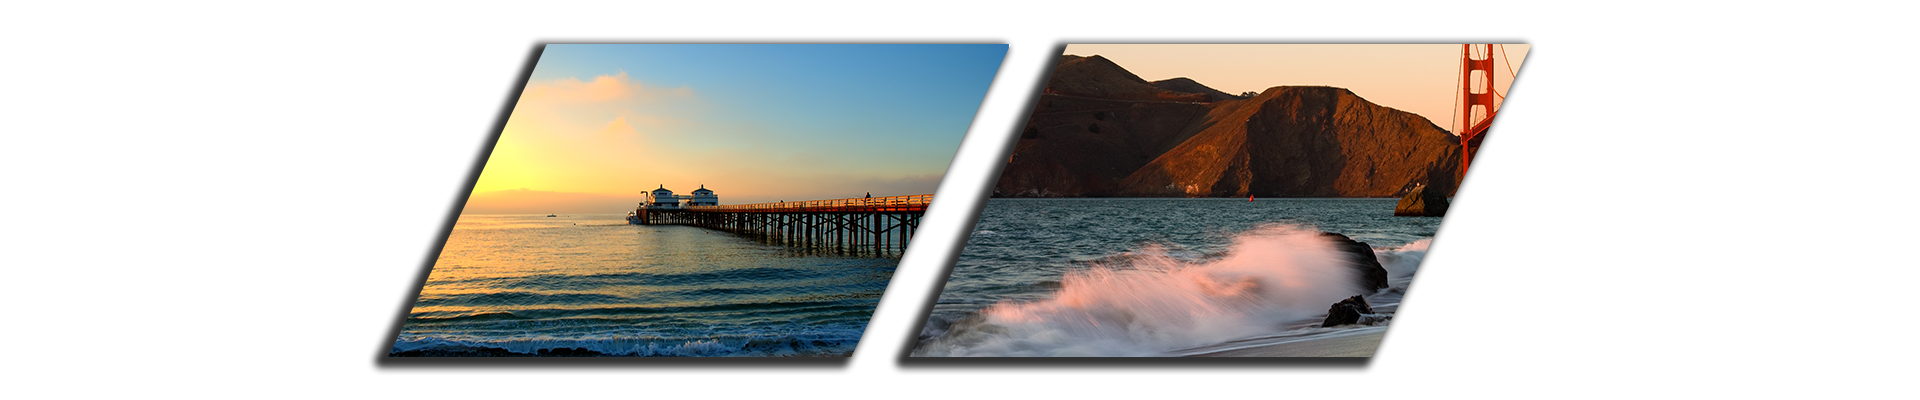 Malibu Beach and San Fransisco in California